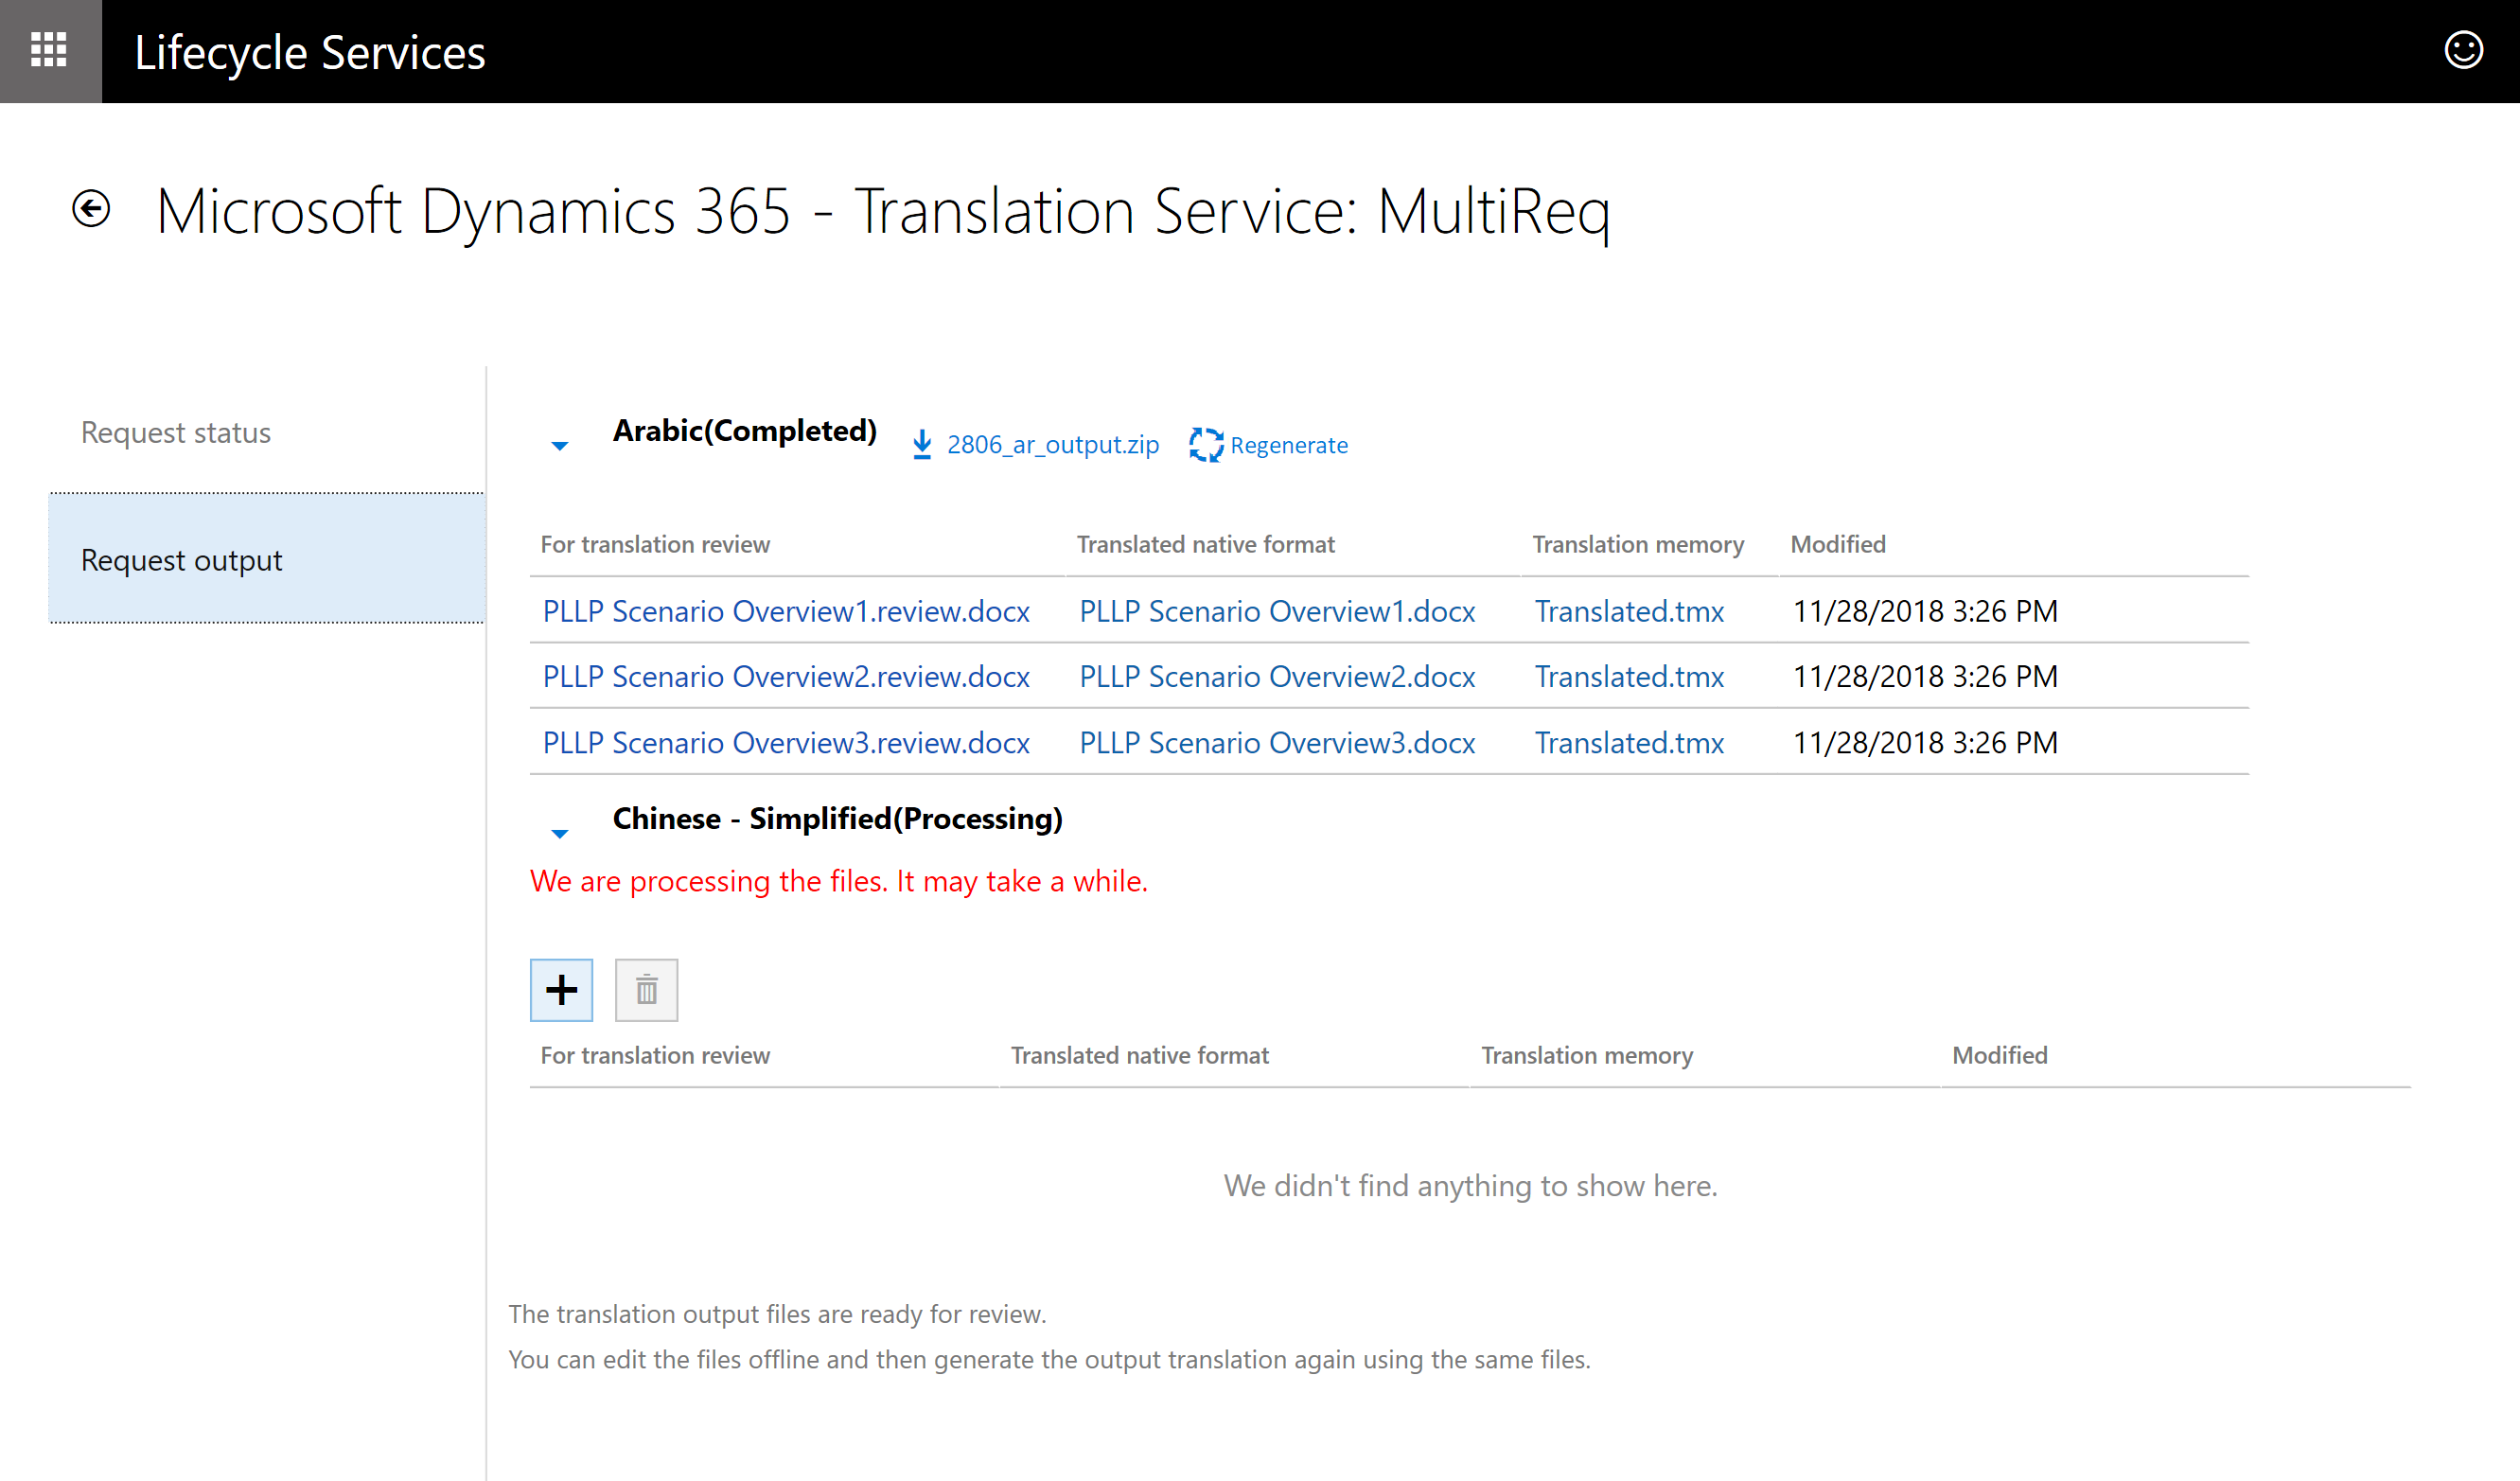 Translate documentation files - Finance & Operations | Dynamics 365 ...